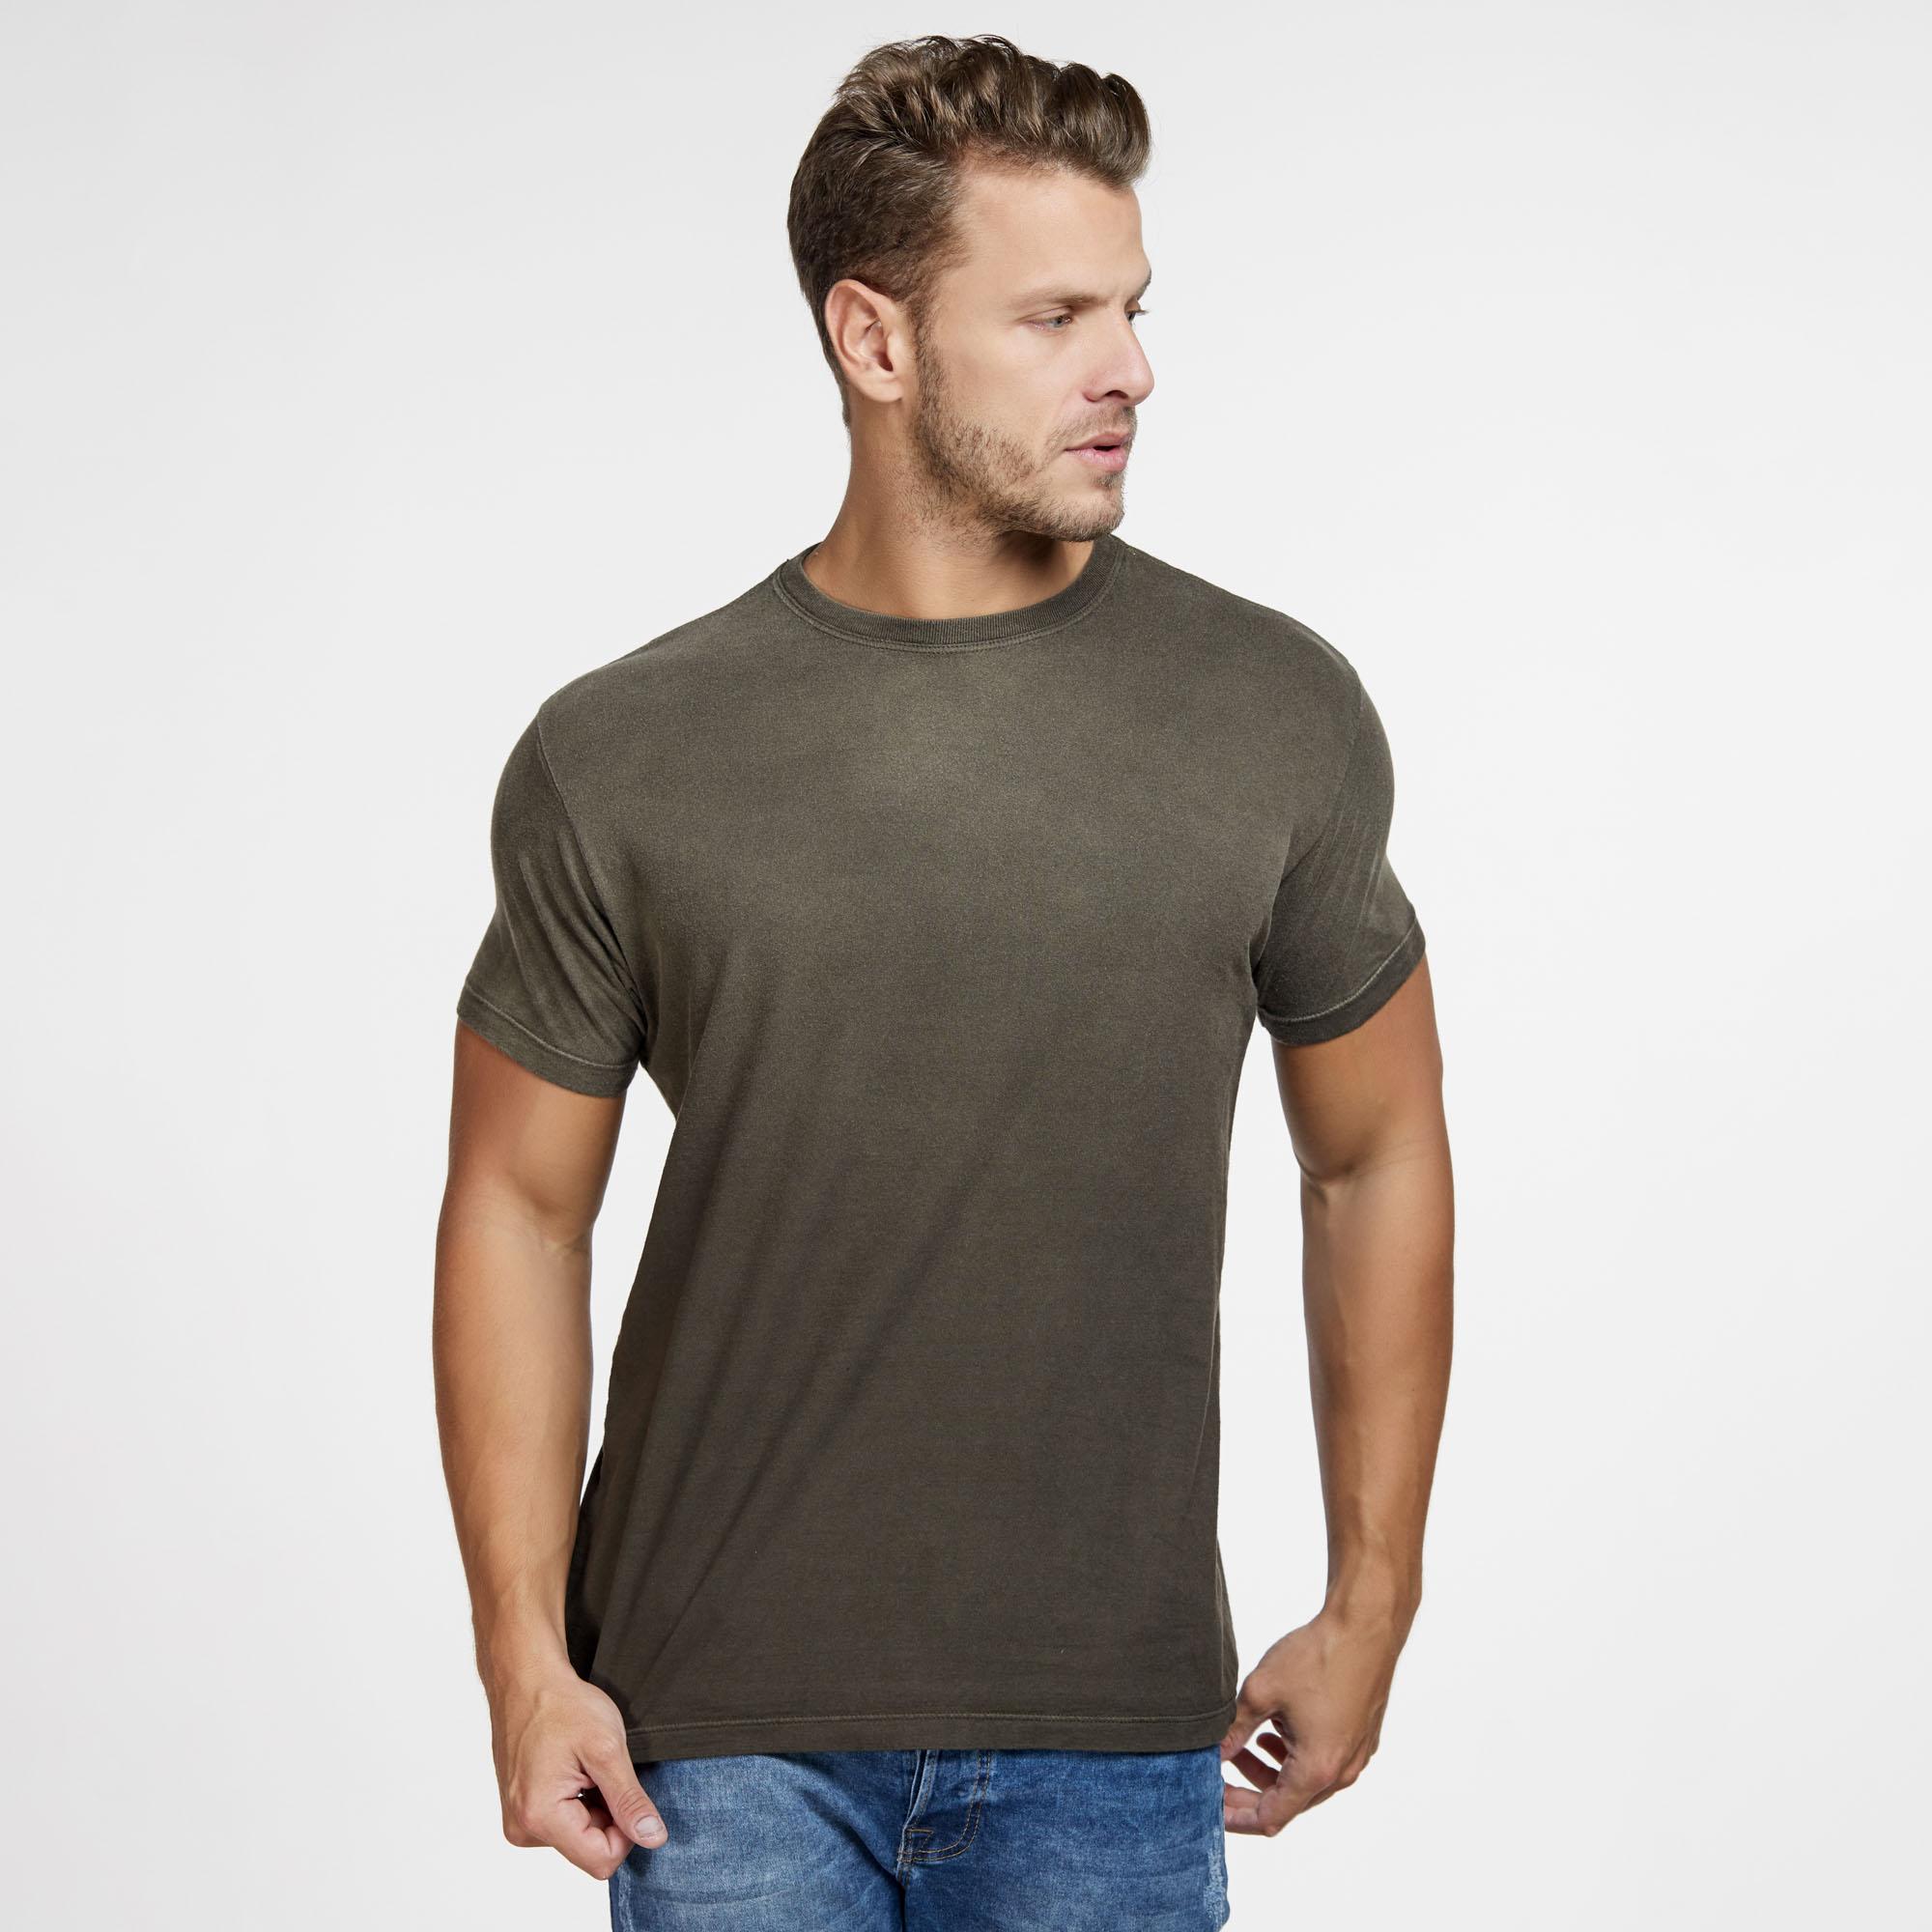 Camiseta Masculina Used Total Marrom